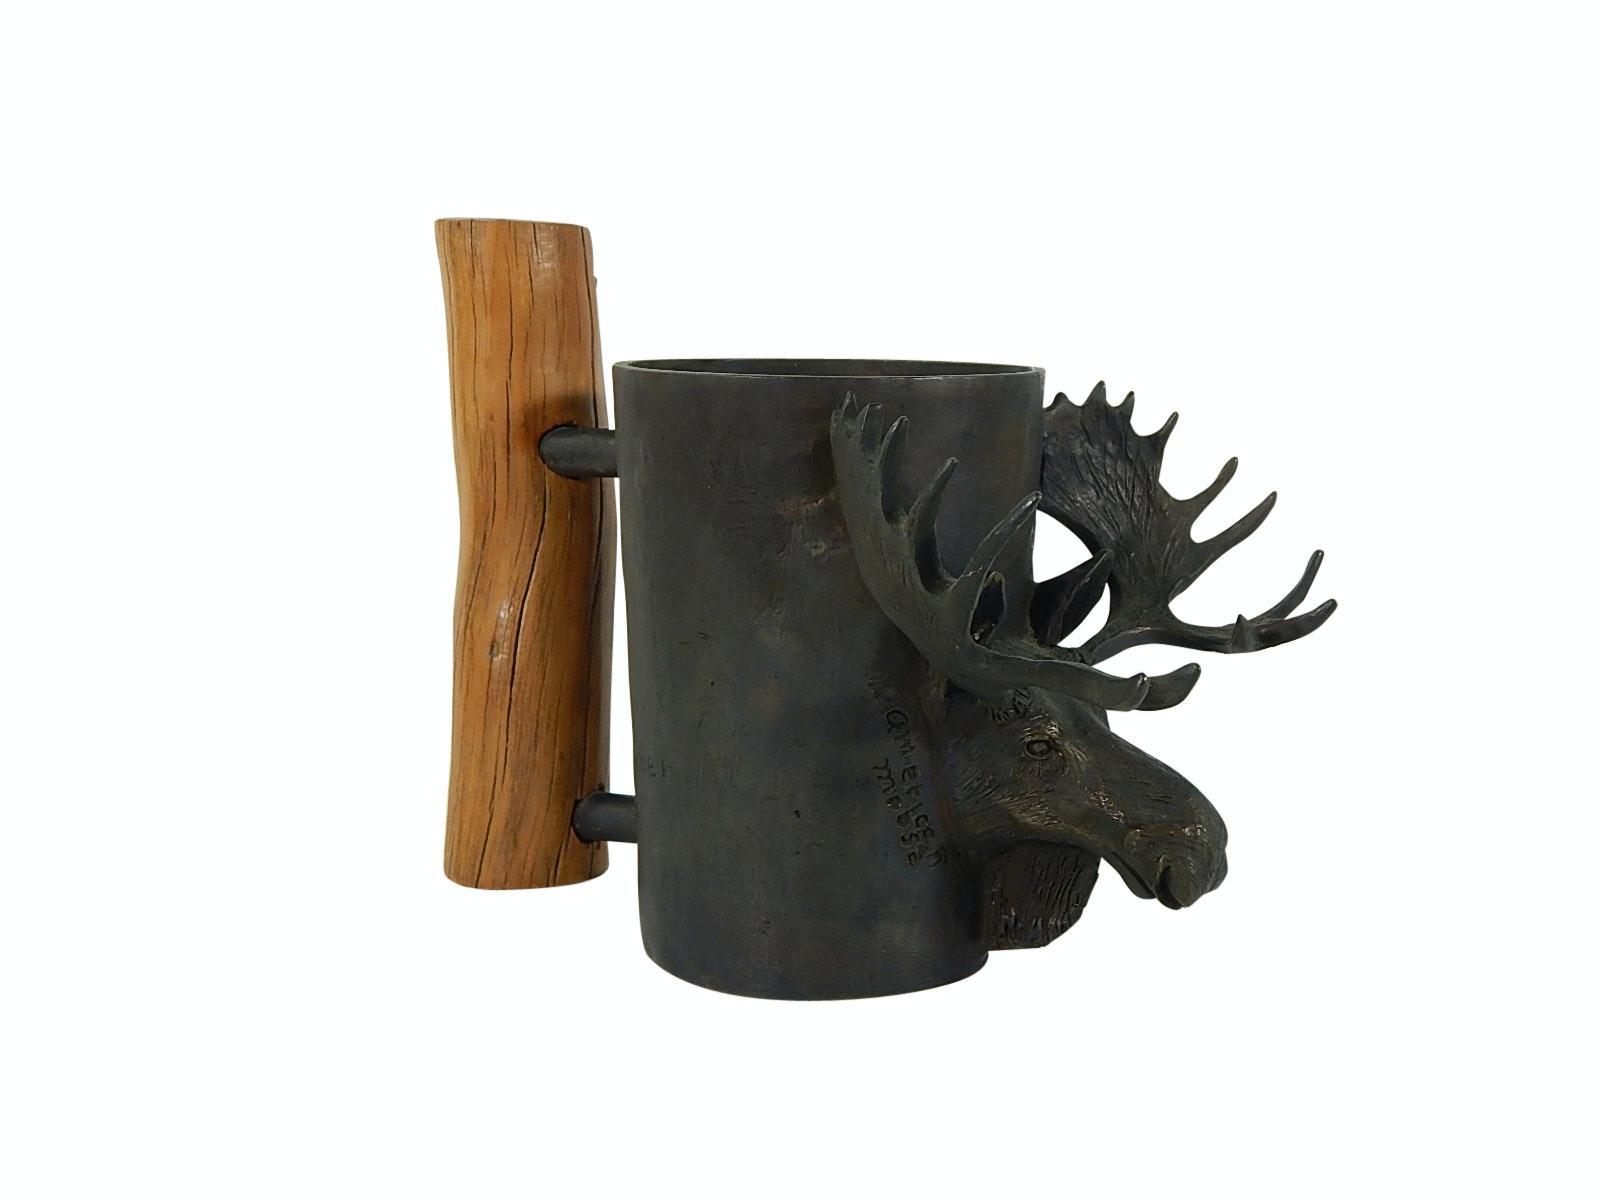 1979 Signed Carl Wagner Bronze American Moose Mug with Wood Handle